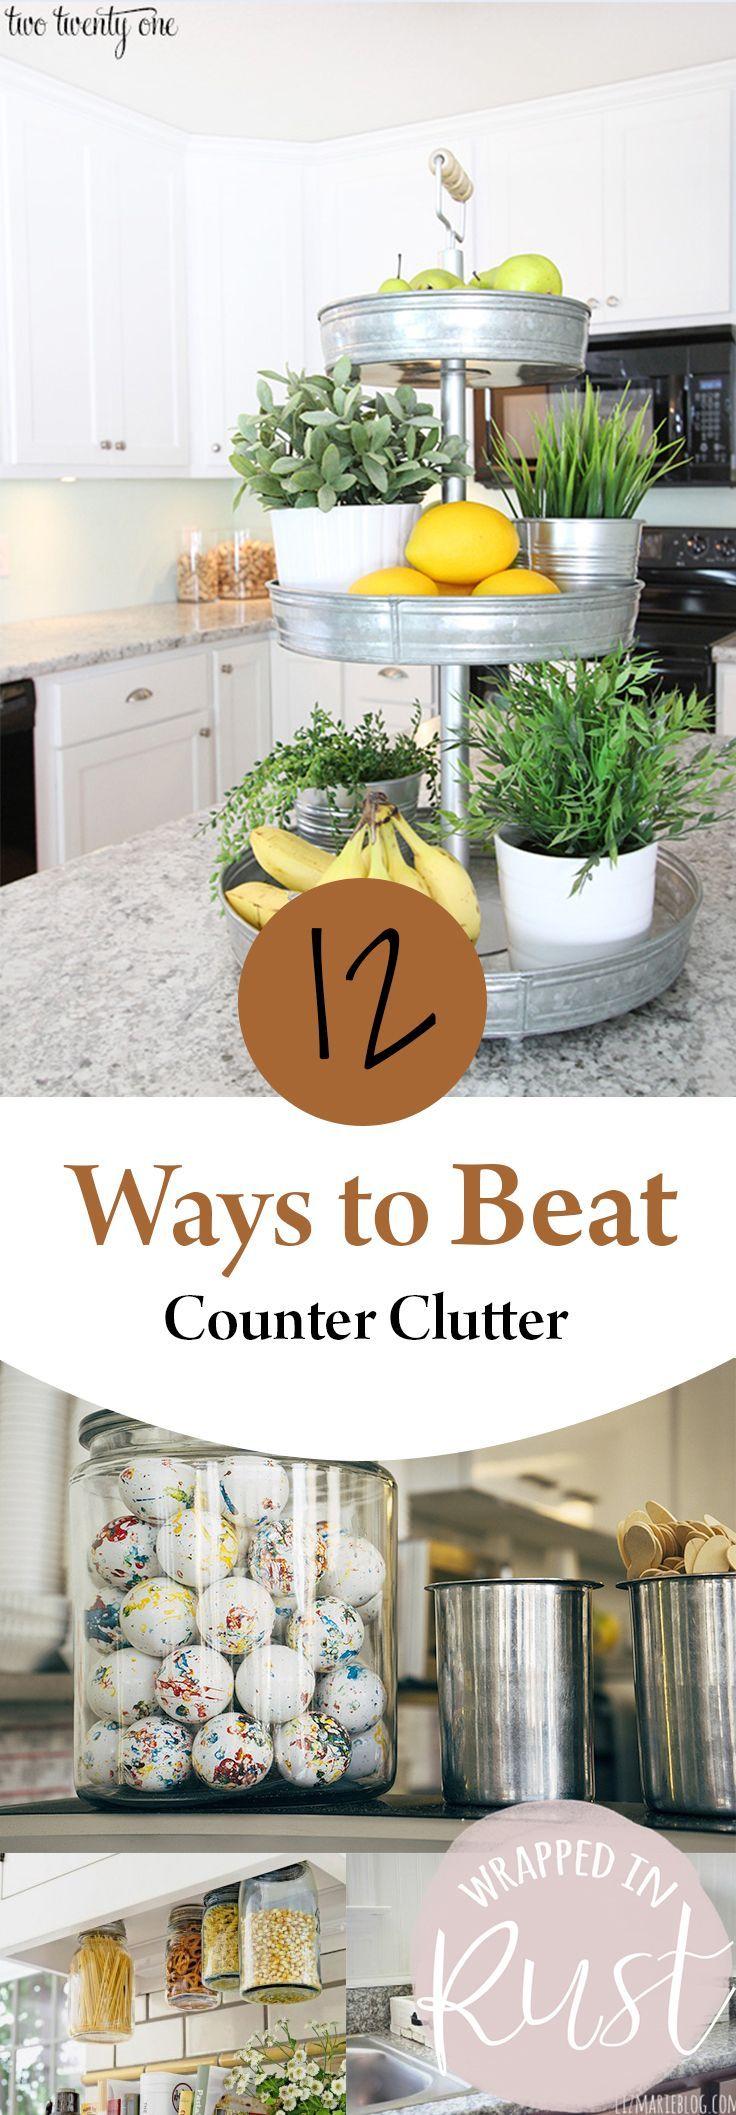 How To Organize Kitchen Countertop